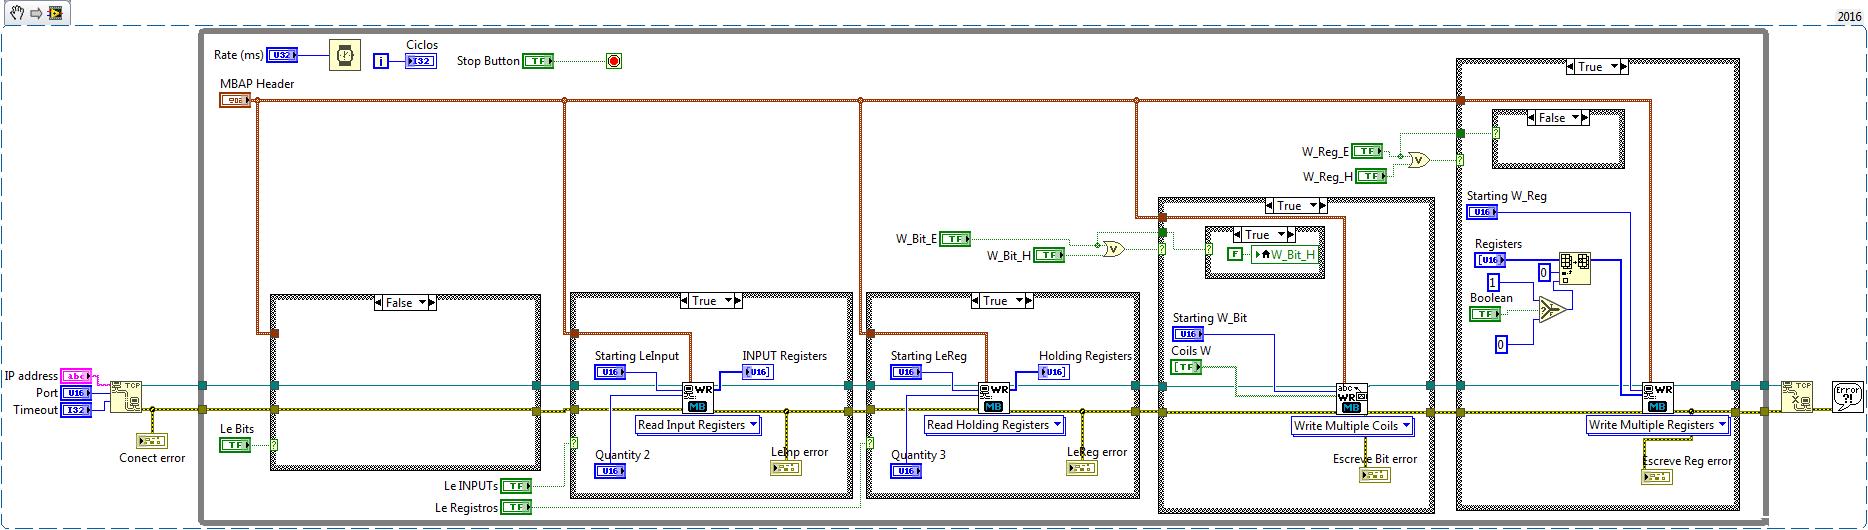 Solved: Error 66 on Modbus Master lvclass:Read Holding